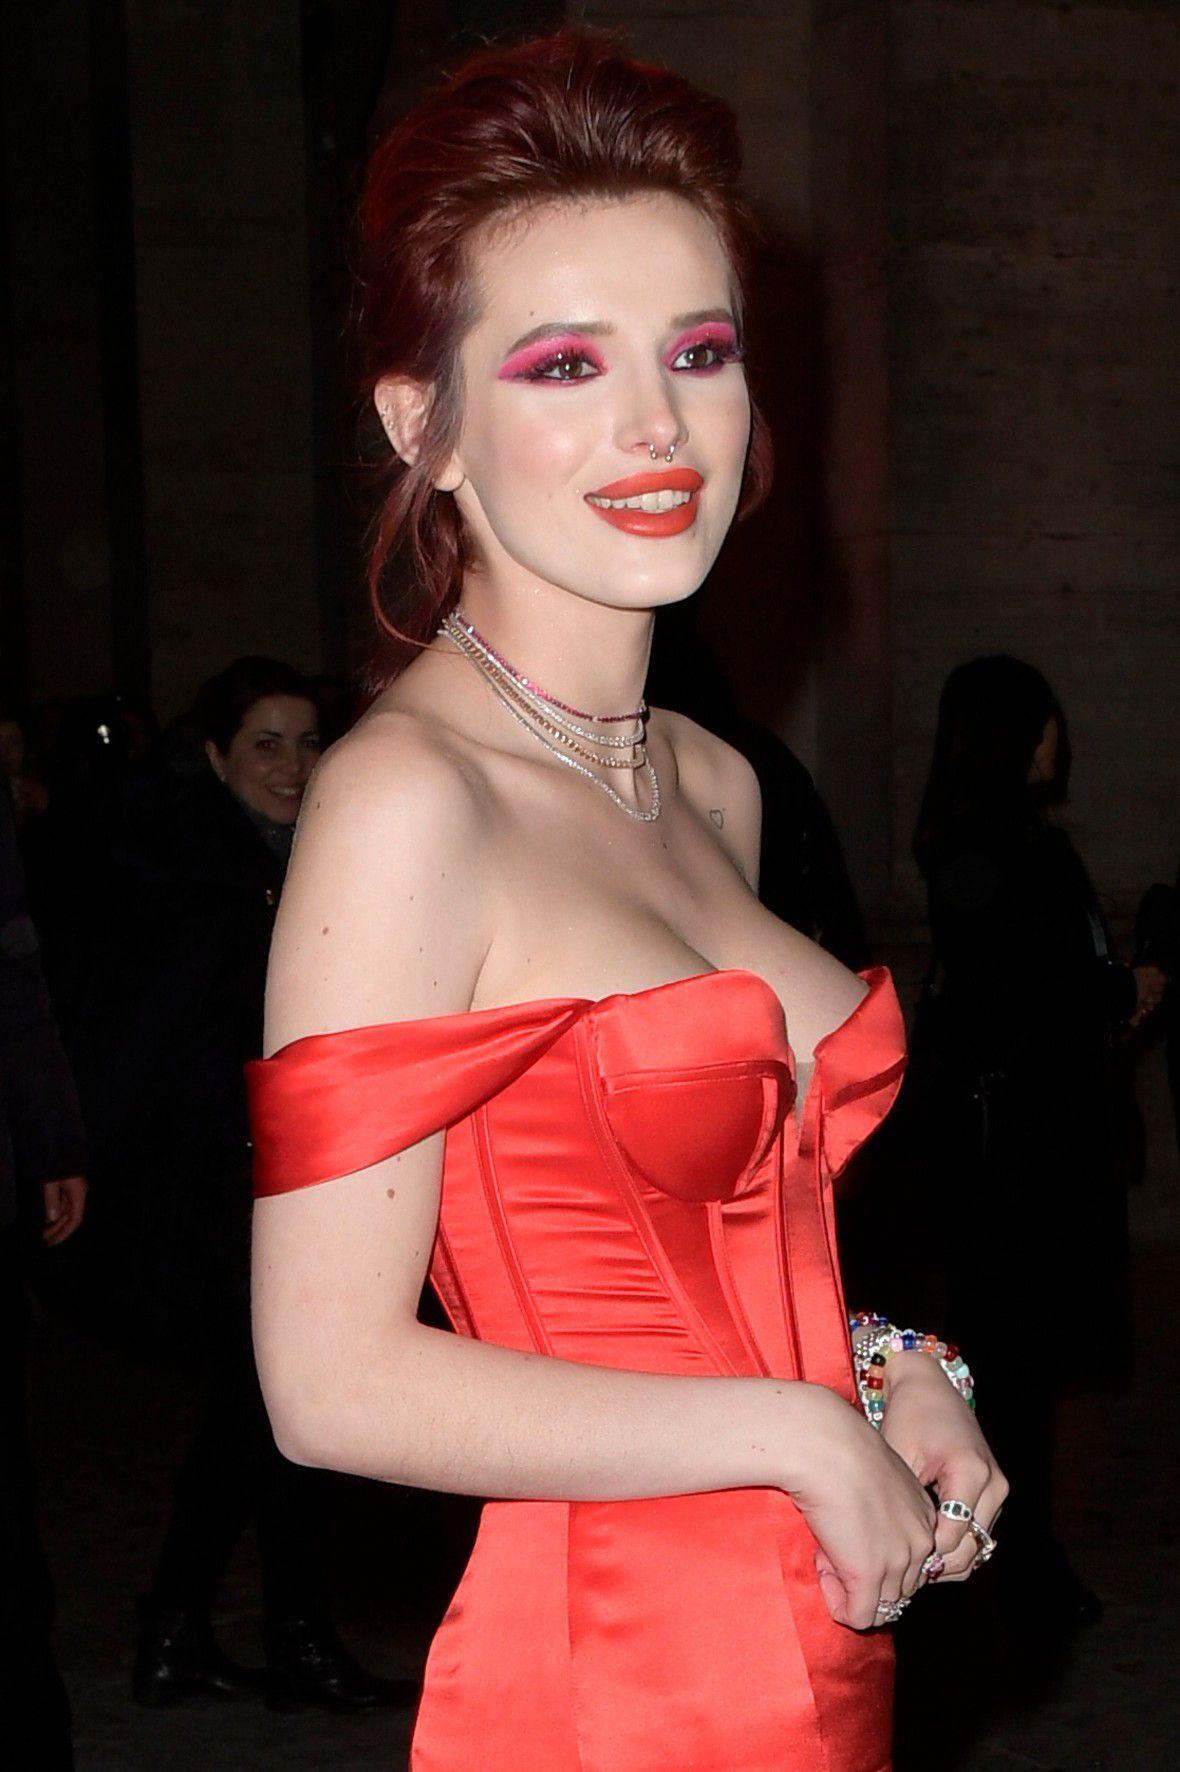 bella-thorne-deep-cleavage-at-midnight-run-premiere-in-rome-1461